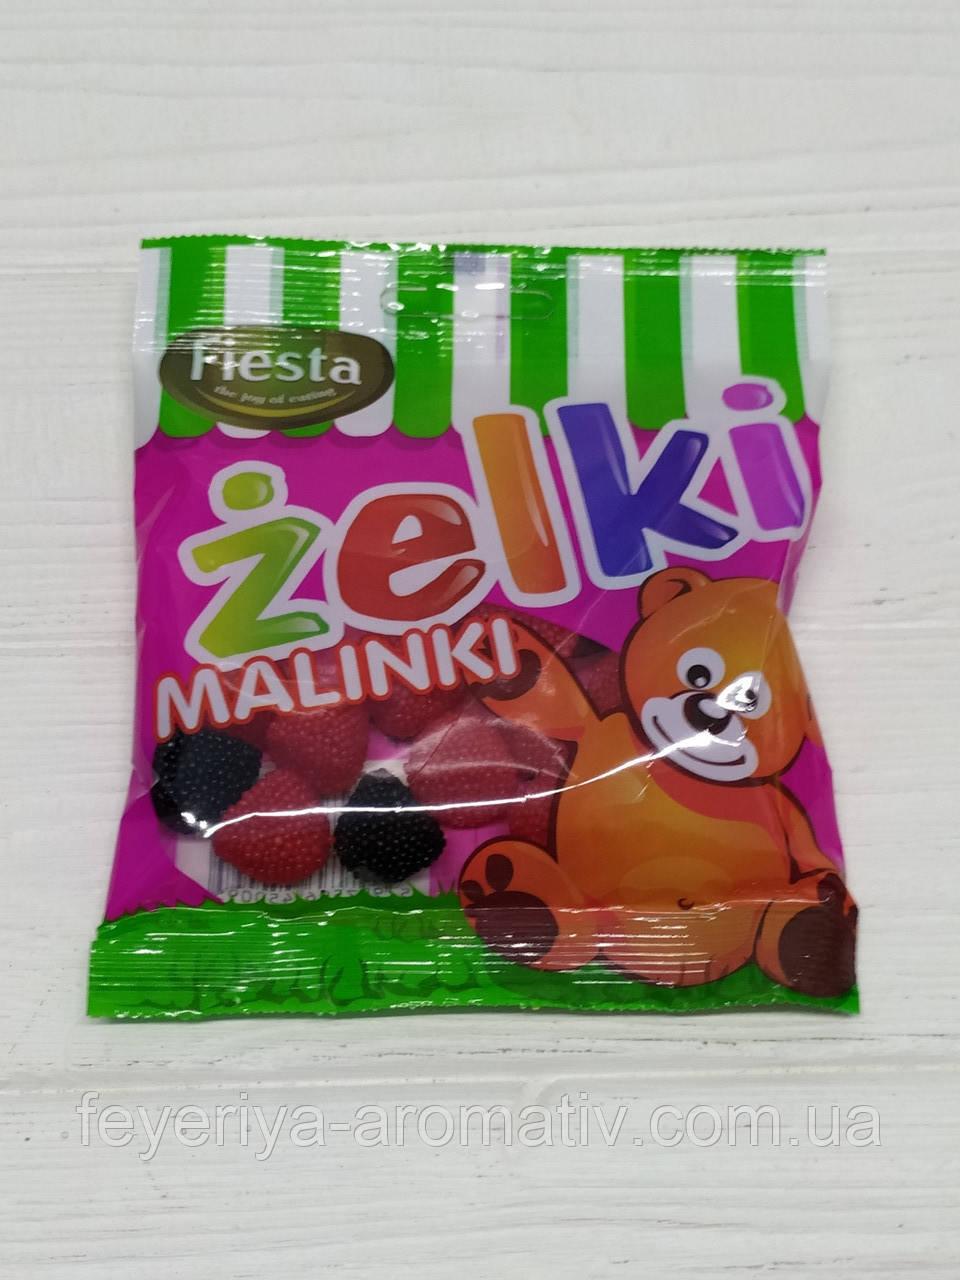 Желейные конфеты Fiesta Zelki Malinki 80гр (Польша)